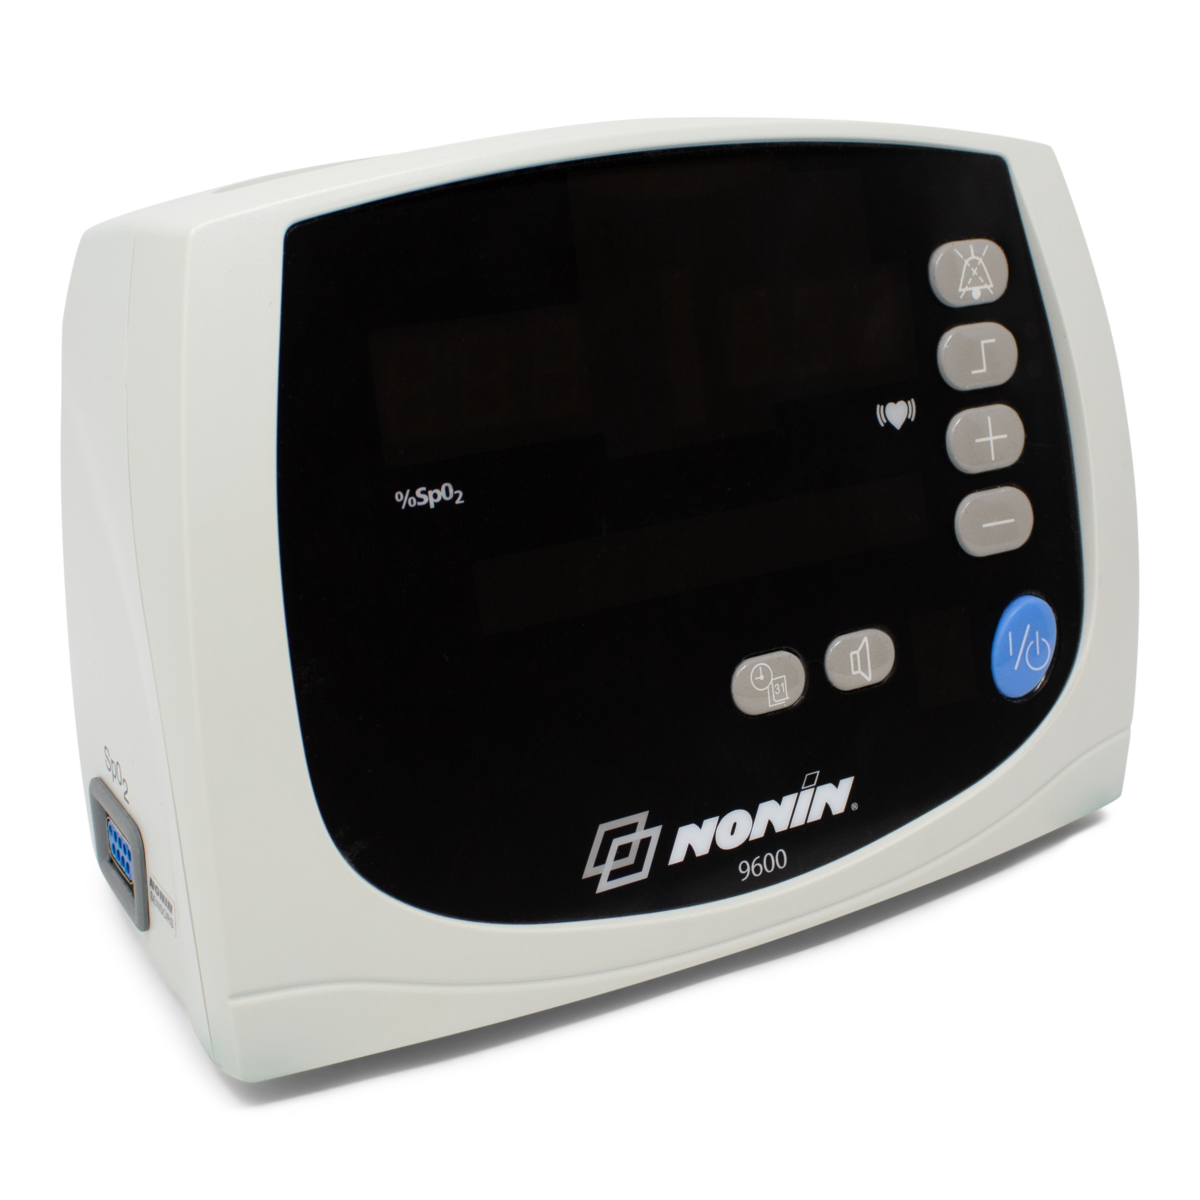 Nonin Avant® 9600